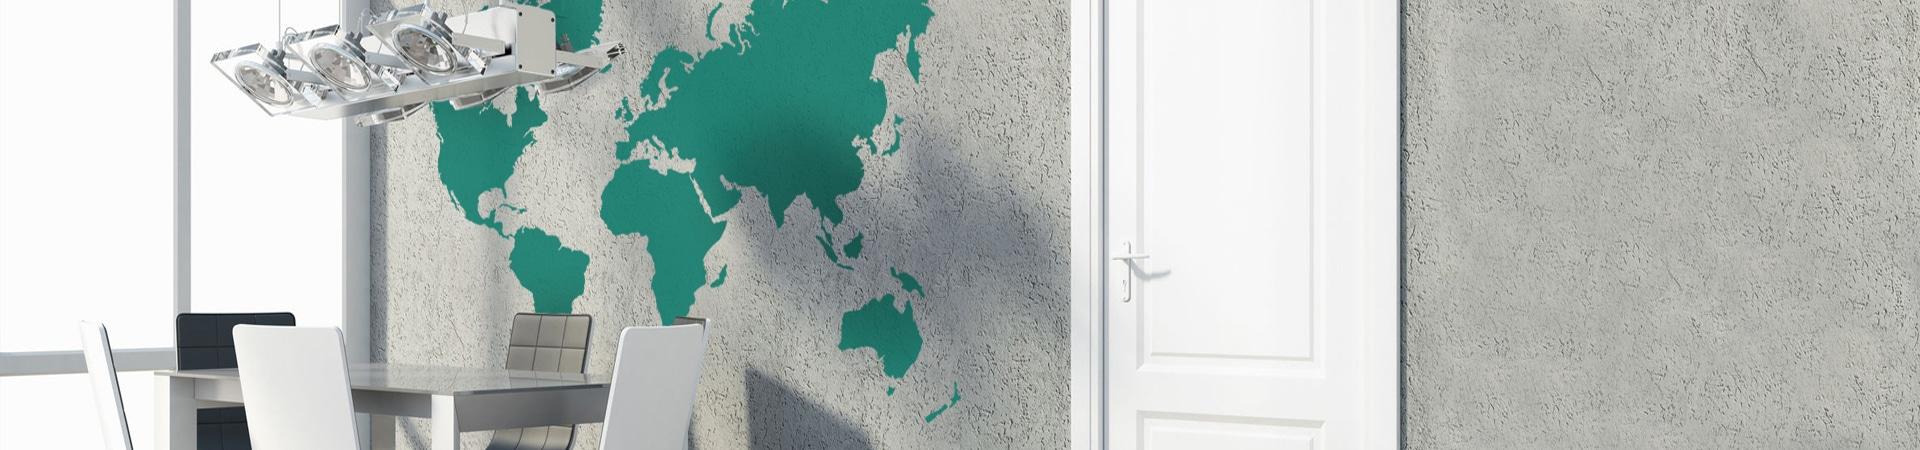 wereldkaart-interieurstickers almere